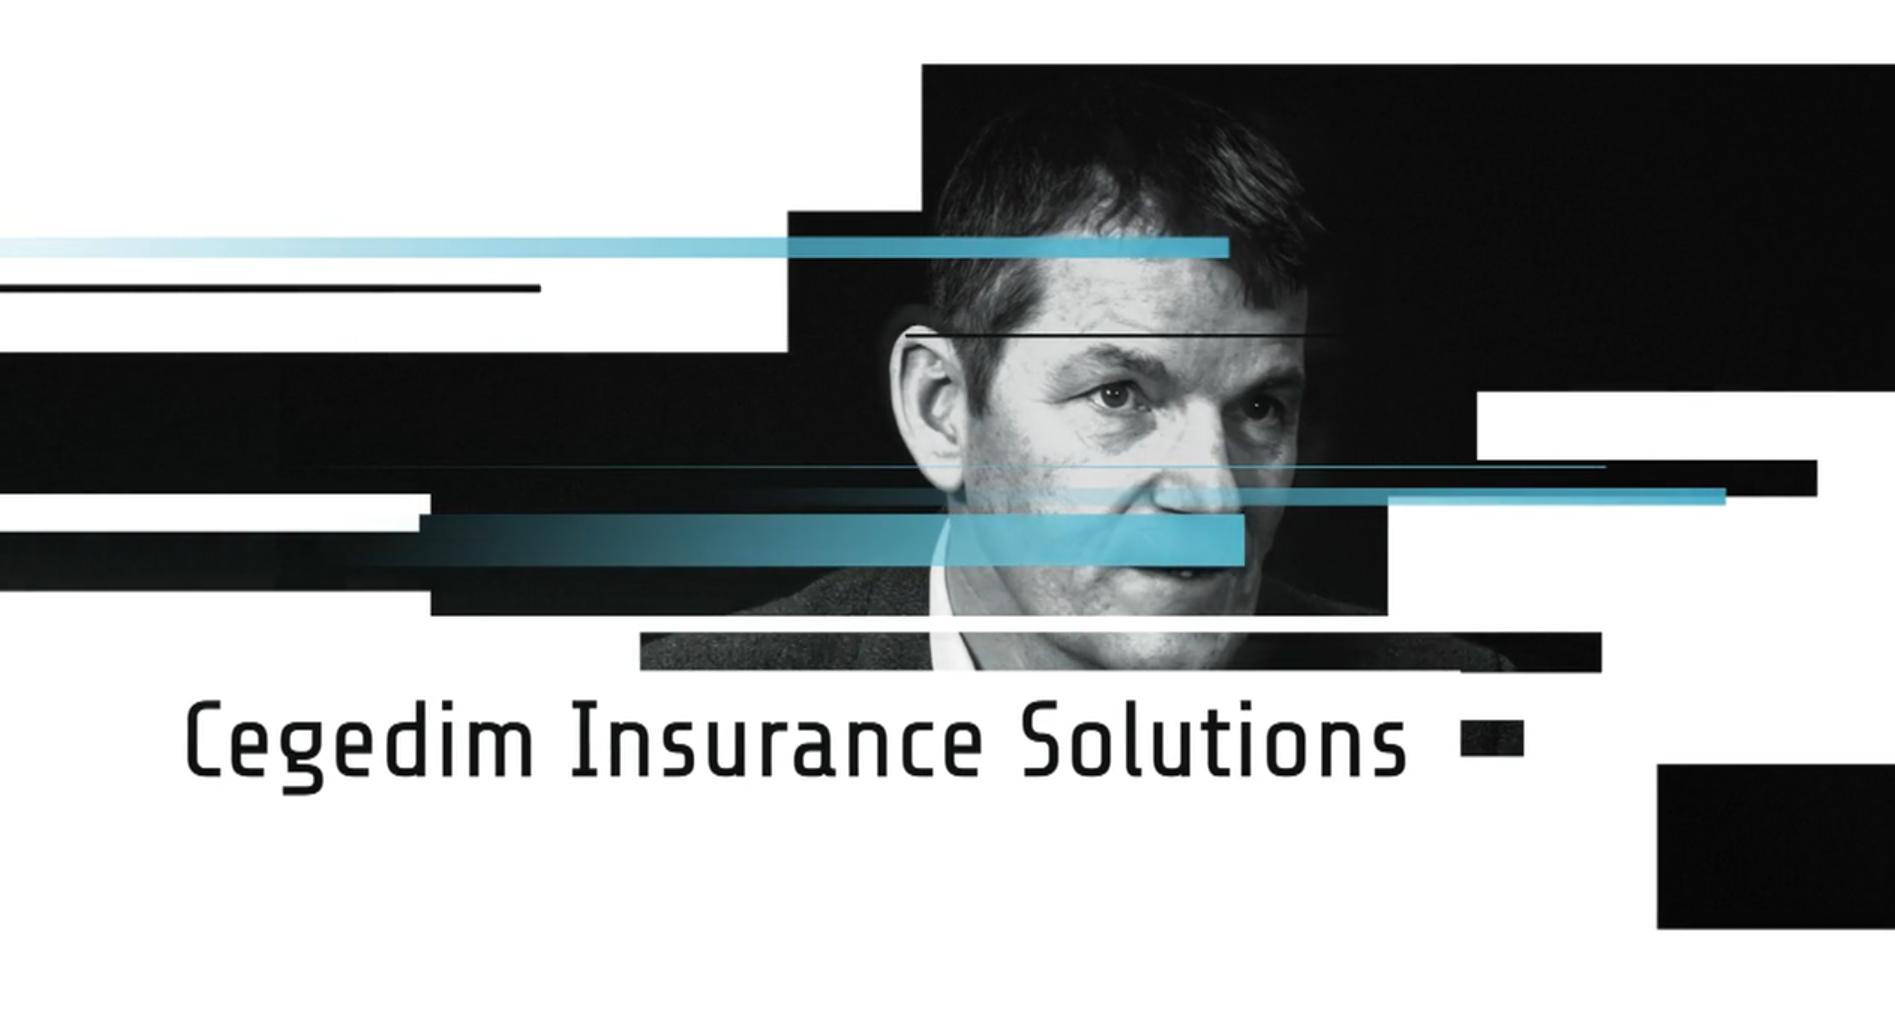 Poster Video Cegedim Insurance Solutions